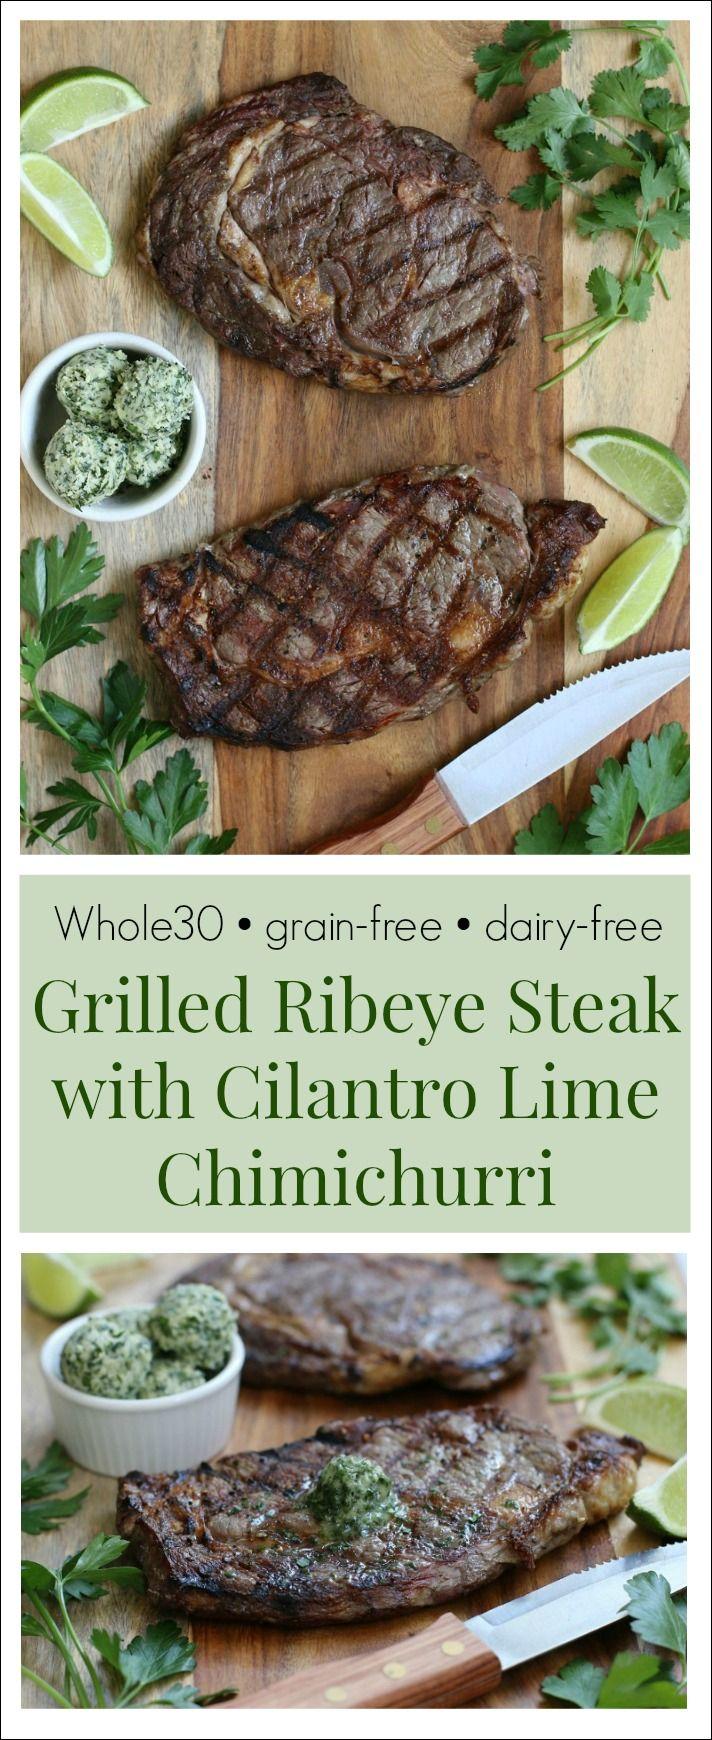 Grilled Ribeye Steak with Cilantro Lime Chimichurri {Whole30, Grain-Free, Dairy-Free}